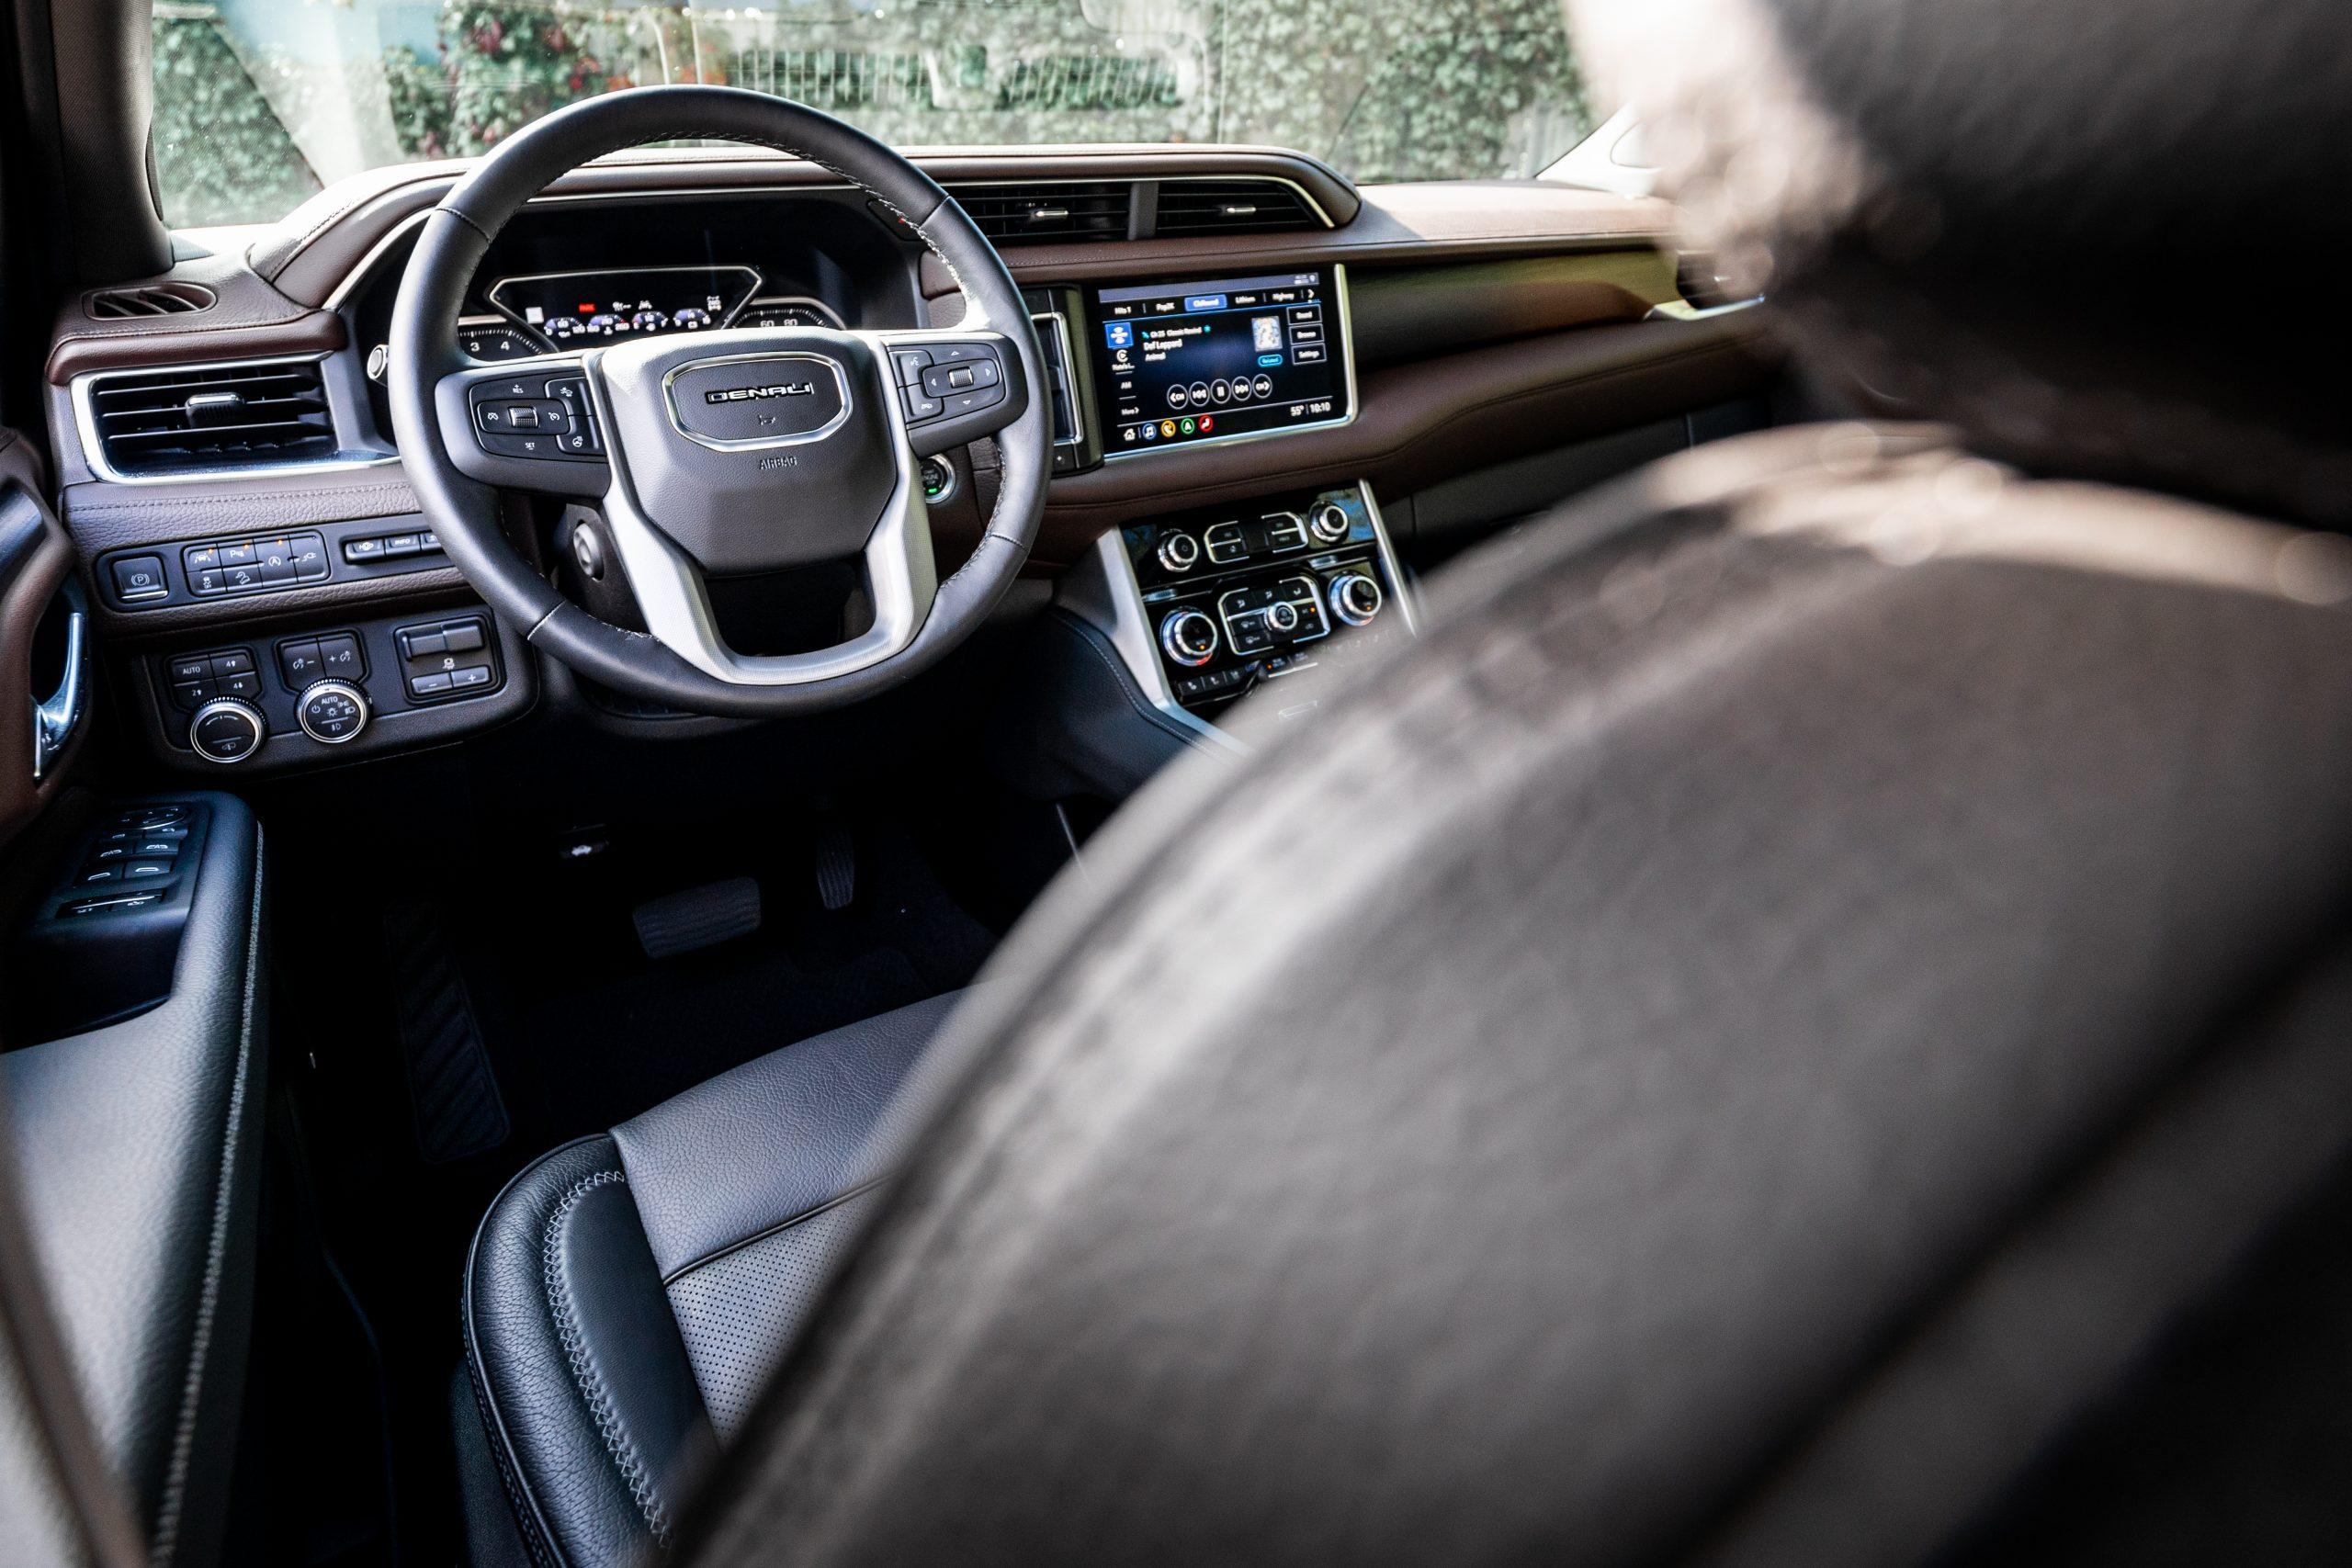 2021 Yukon Denali steering wheel over drivers seat